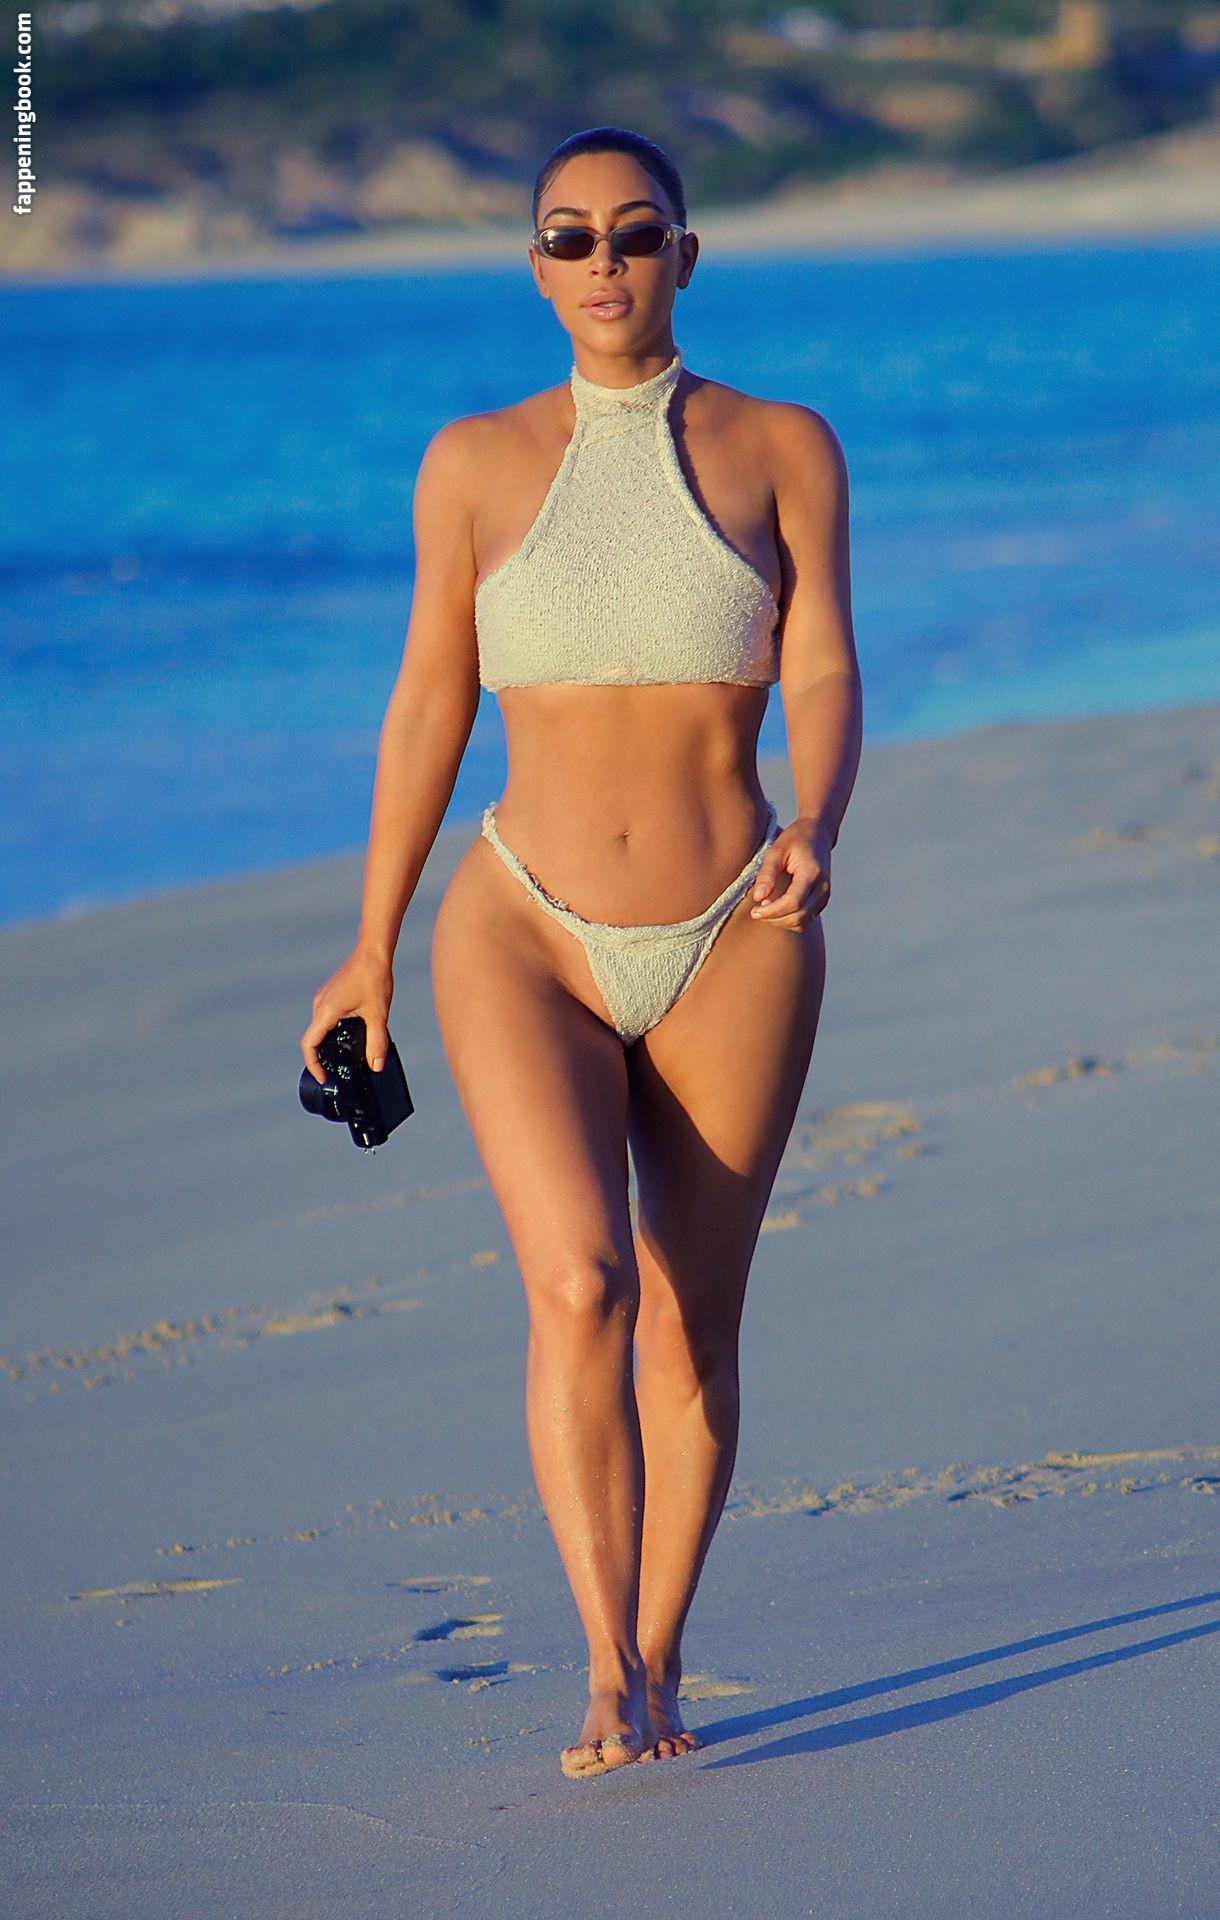 Stars New Nude Pictures Kim Kardashian Jpg